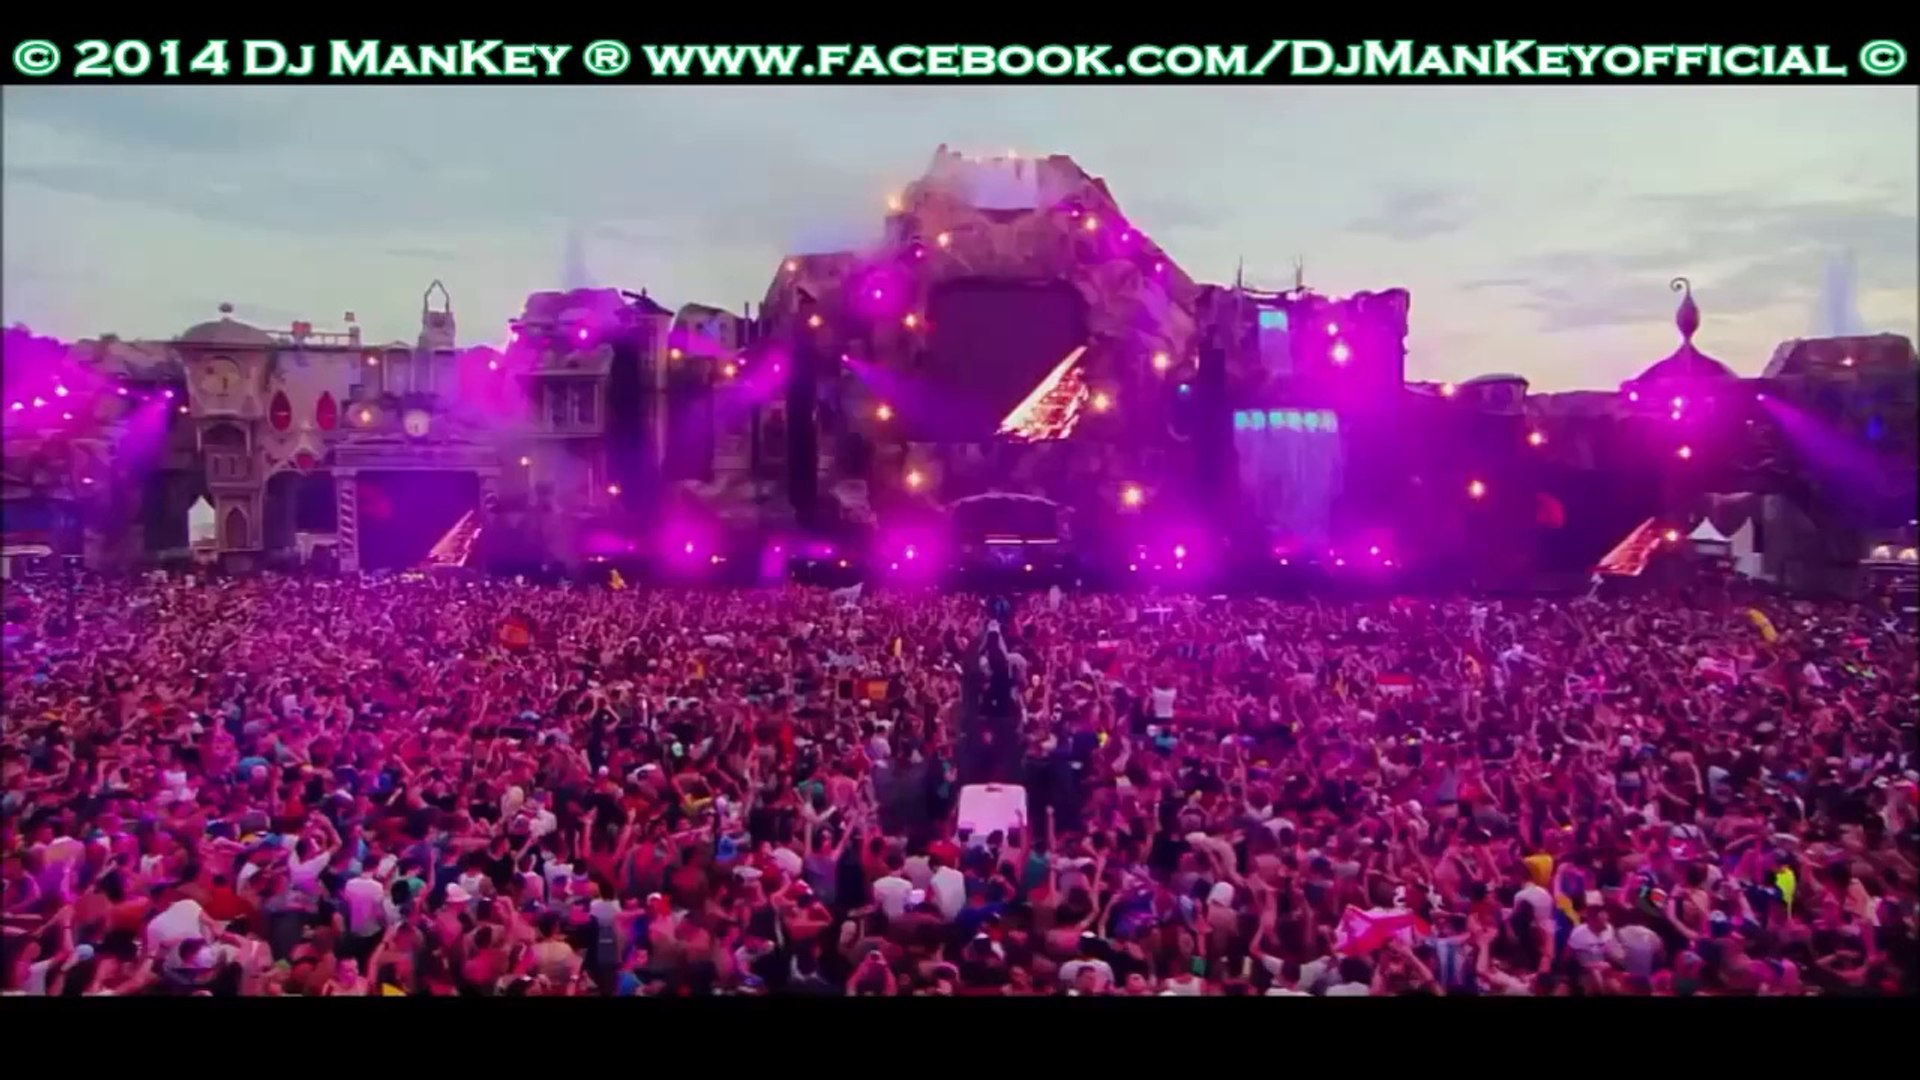 ★ Dance Portugal & Brasil Pista Sertanejo Arrocha Kuduro ★ House Mix Rework by Dj Mankey 2014 ★